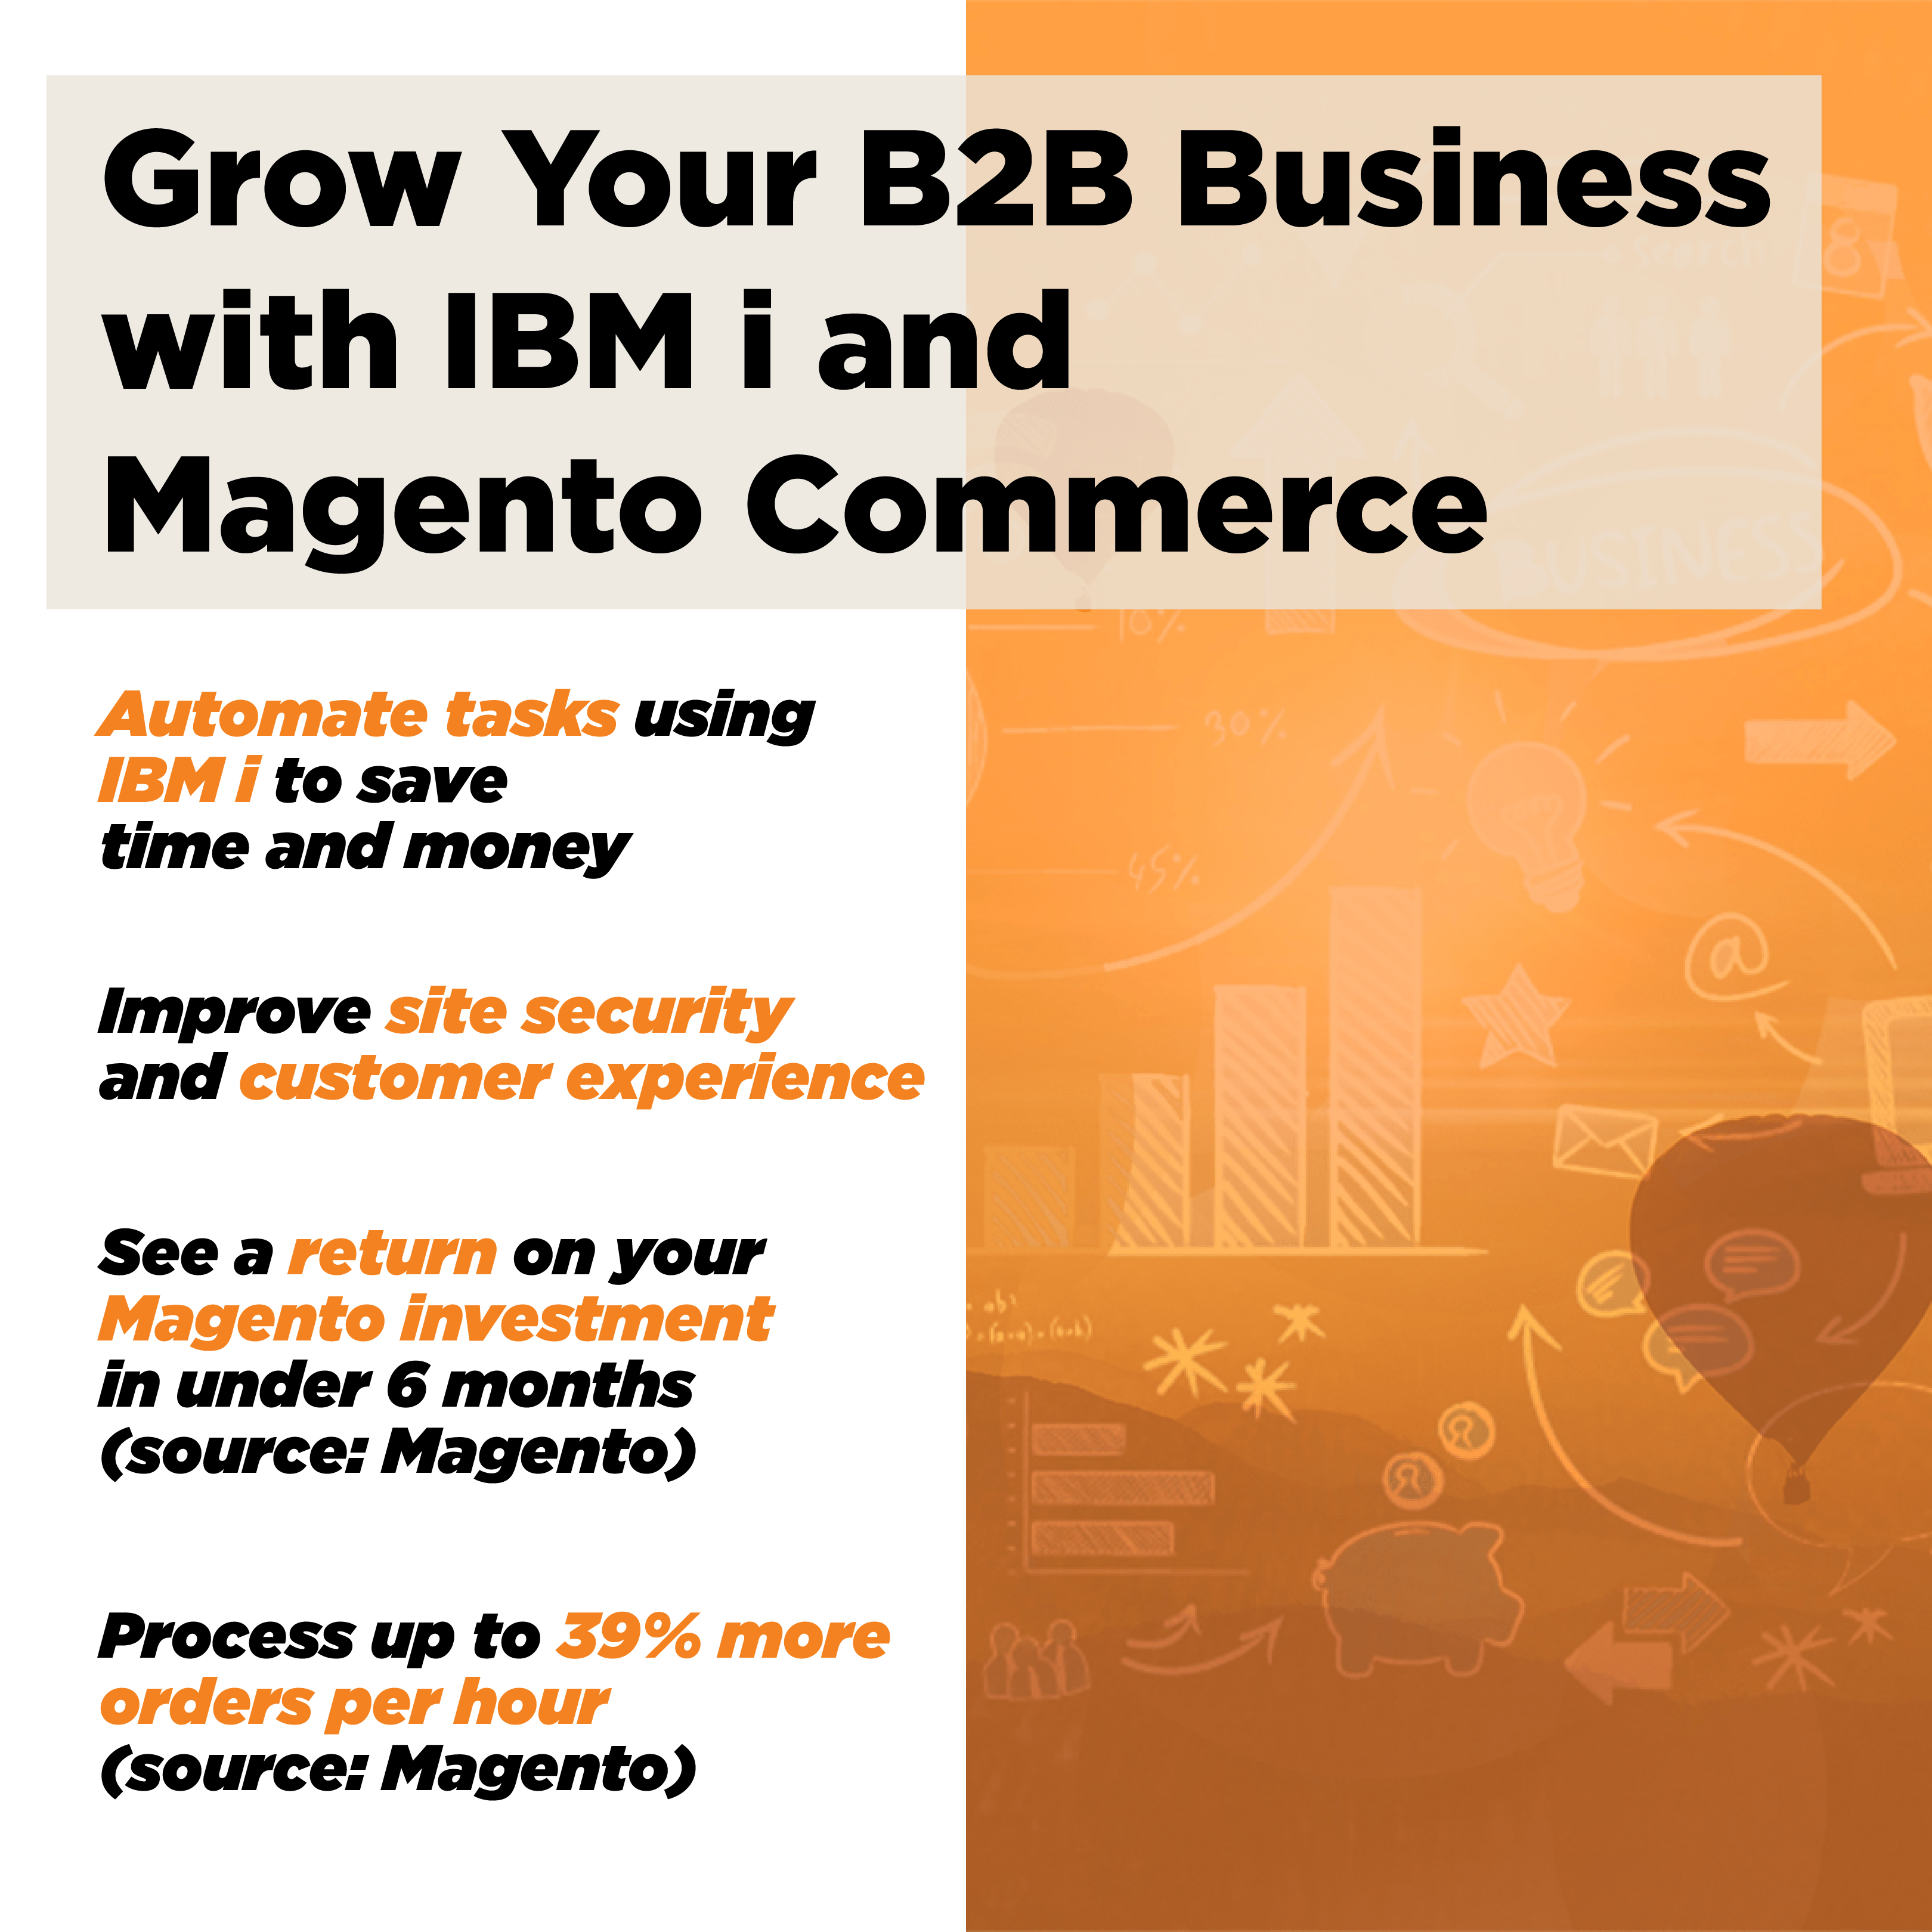 grow-your-b2b-business